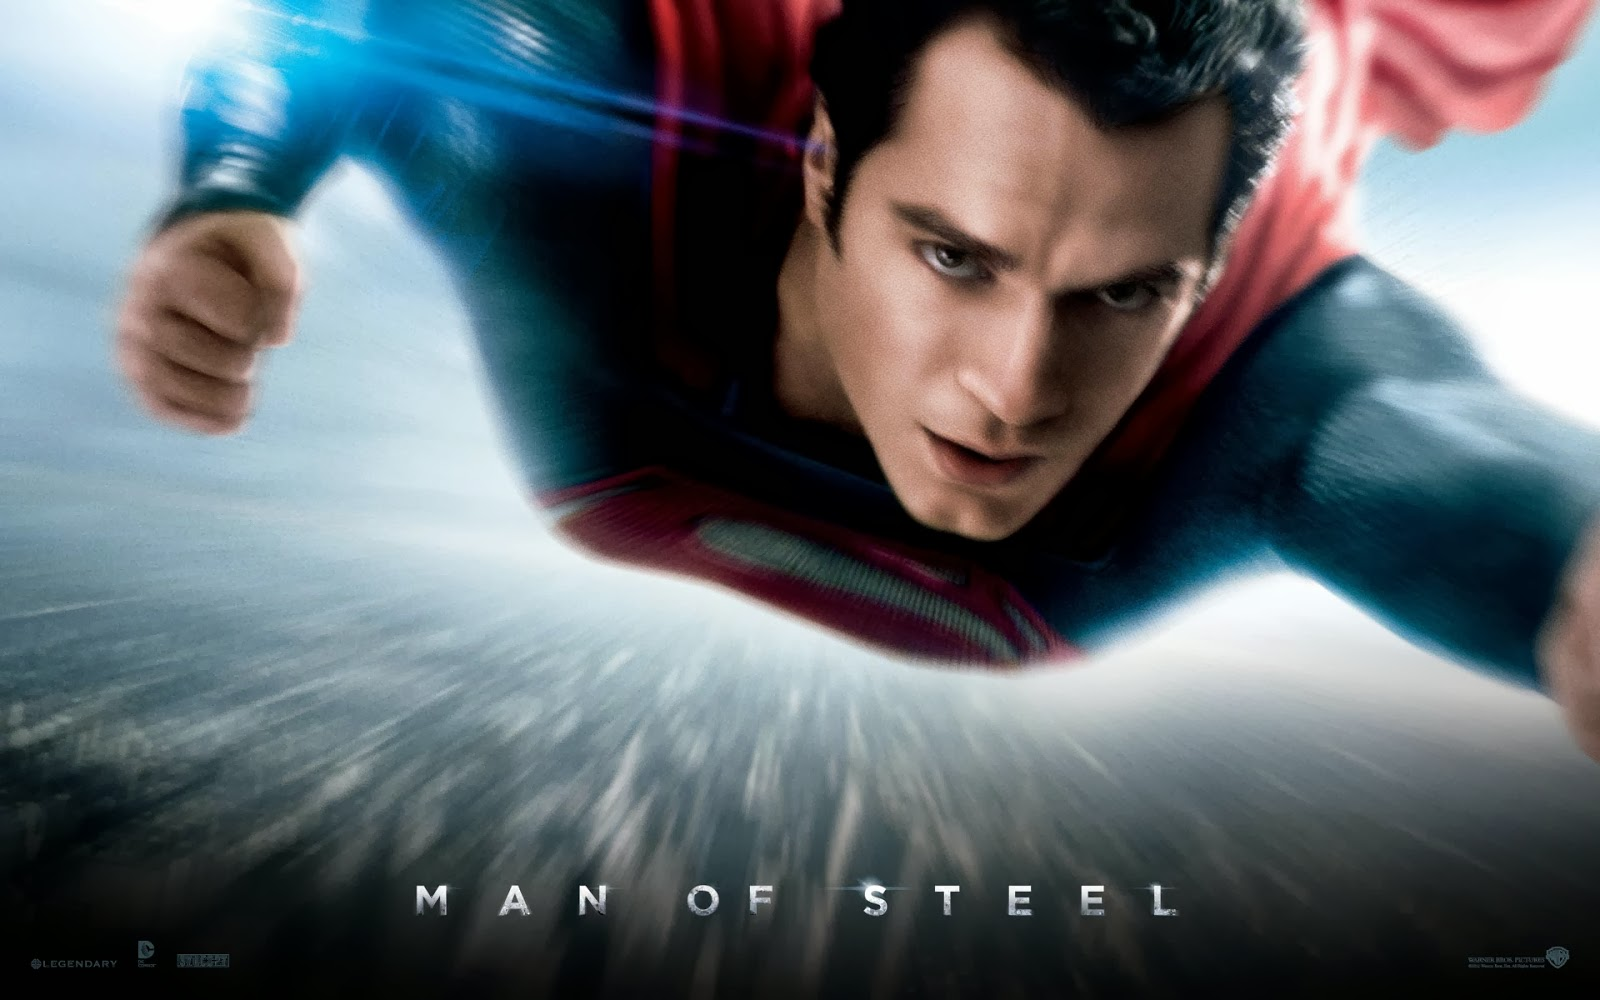 superman film, why man of steel sucked, man of steel, problems with man of steel, man of steel reviews